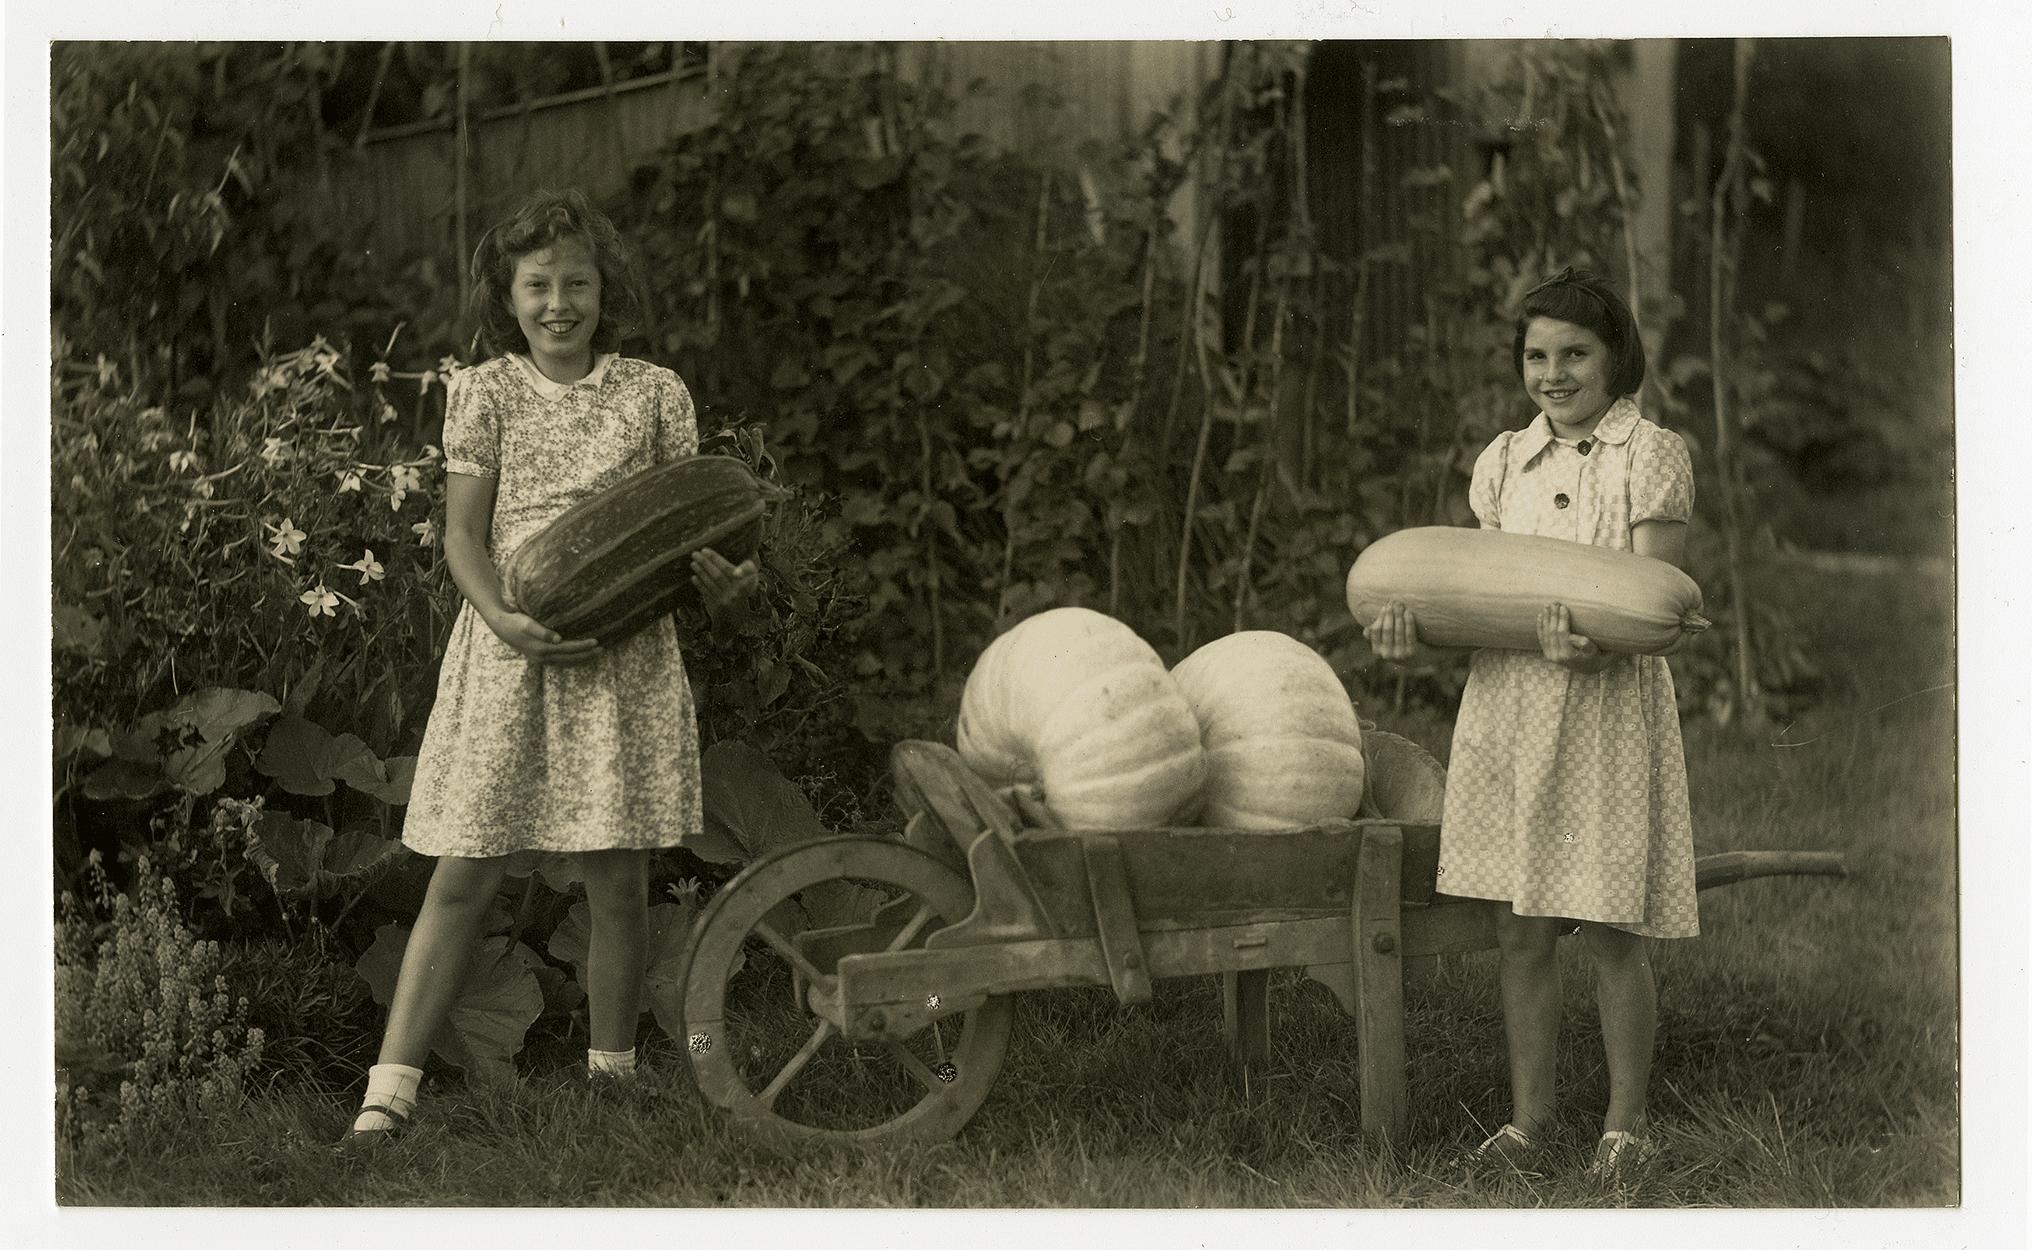 Girls with squash, c.1940